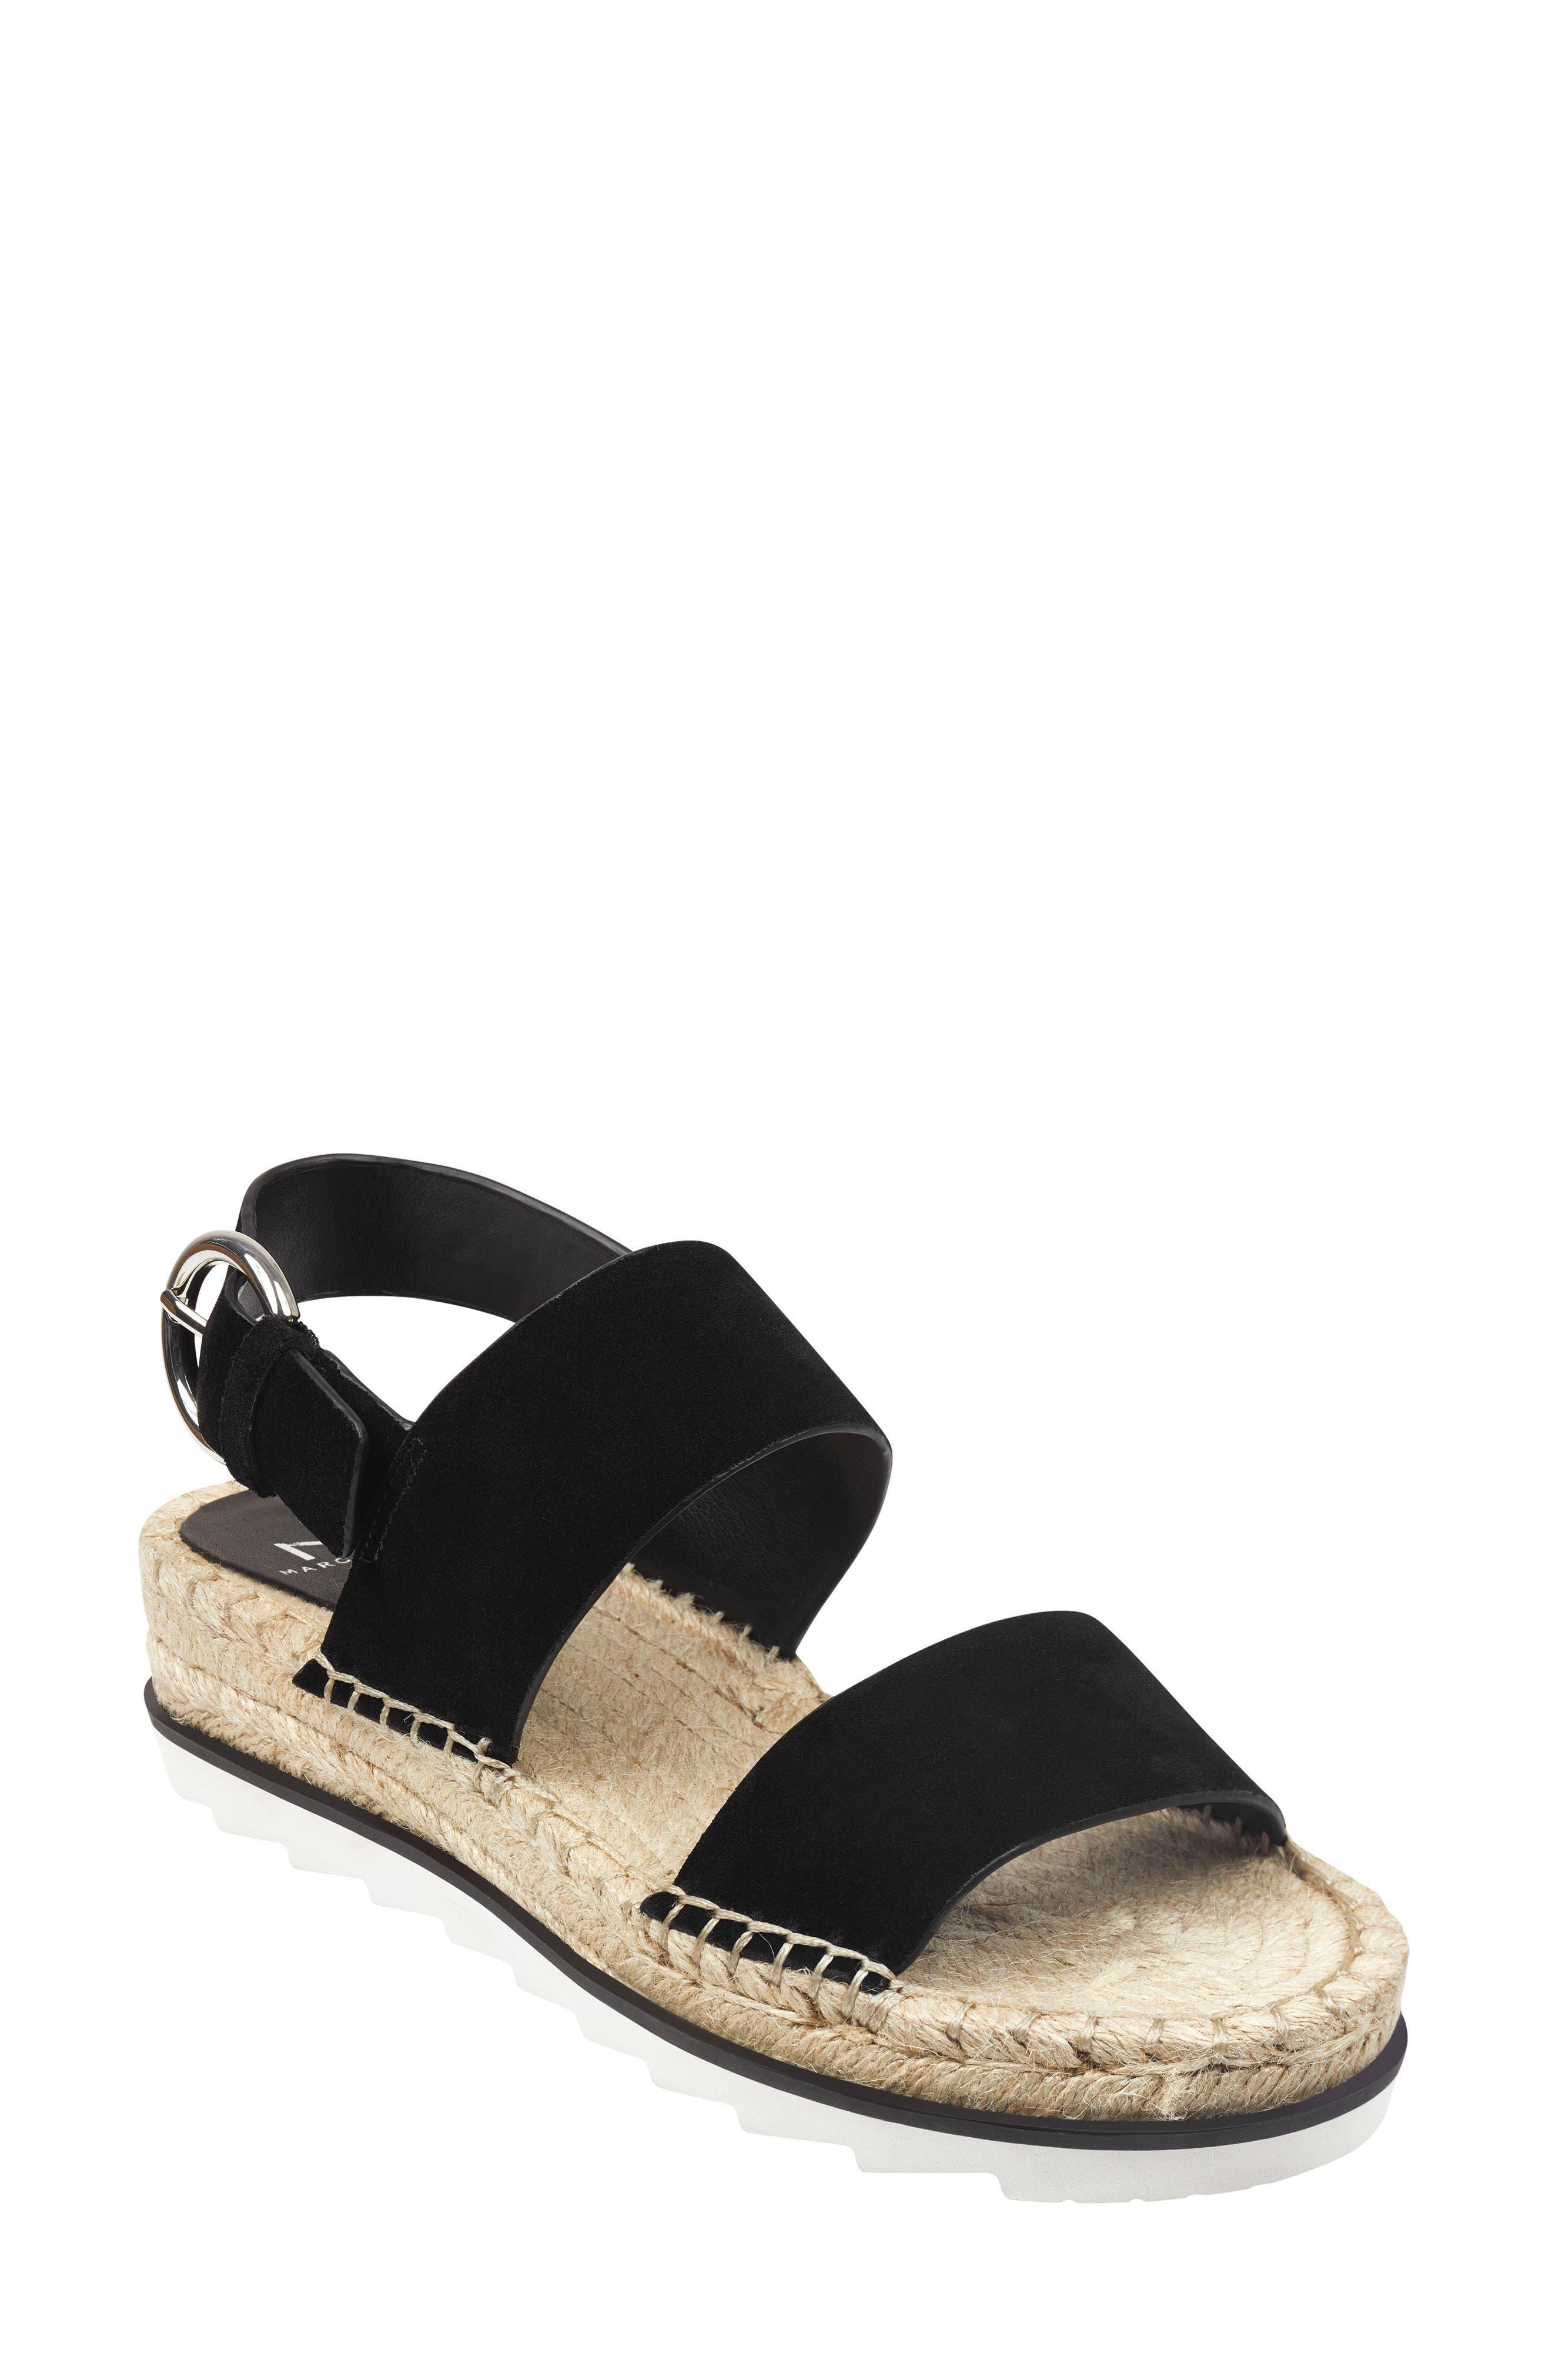 Marc Fisher Ltd Phebe 2 Espadrille Sandal, Black